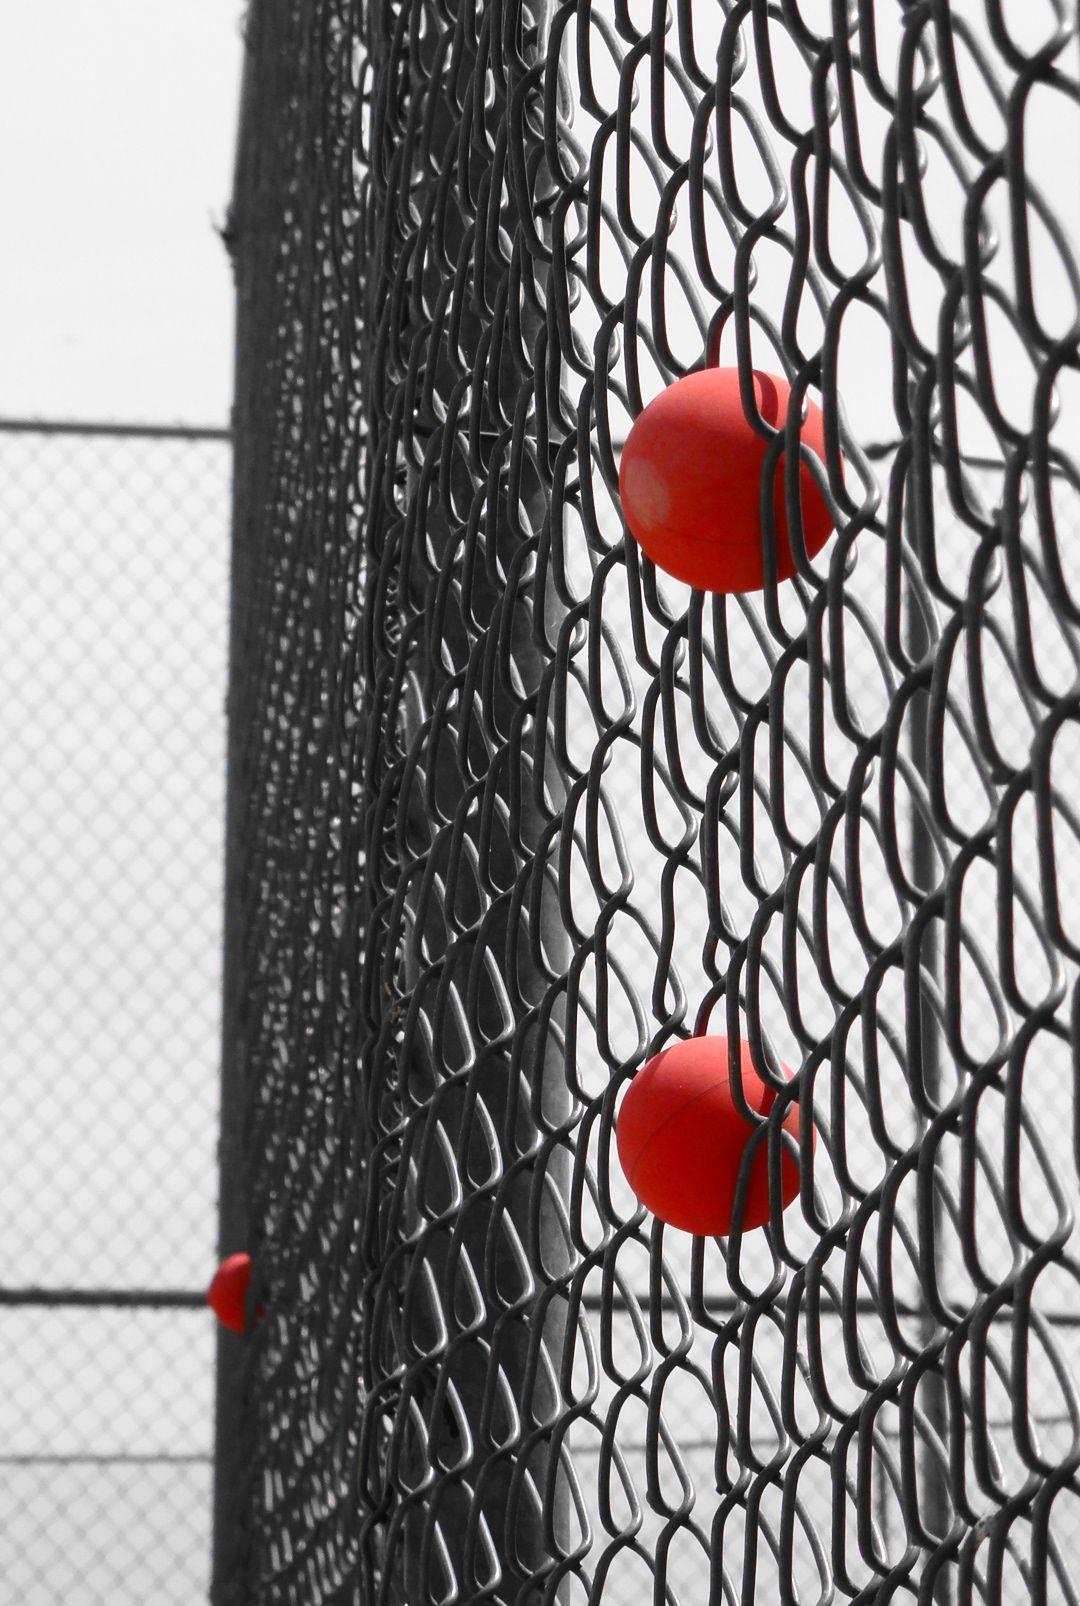 Ball catcher racquetball outdoor outdoor play